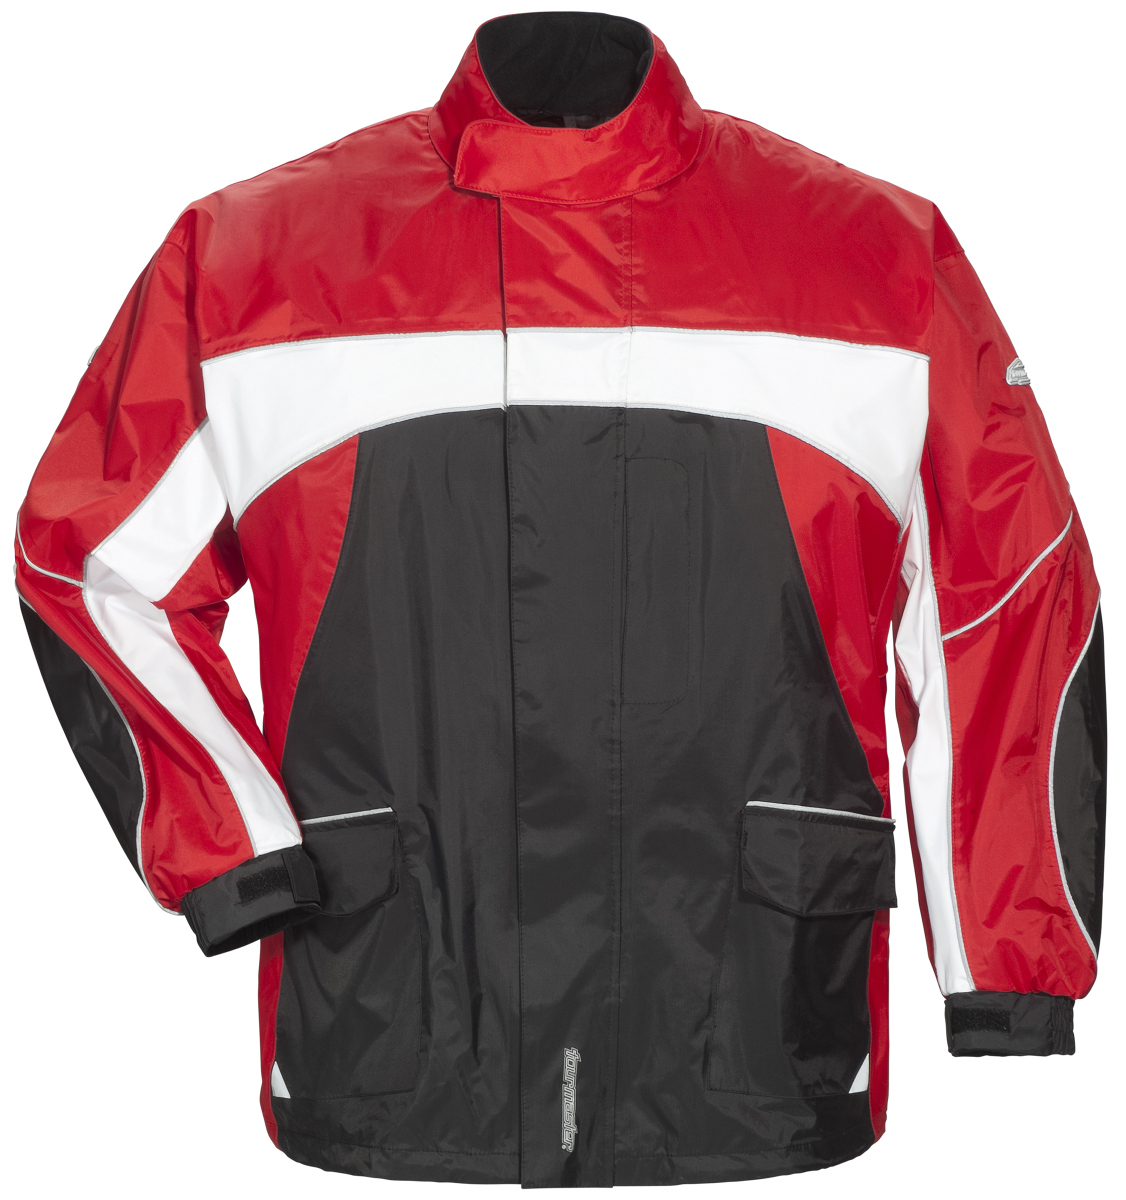 Elite 3 Rain Jacket